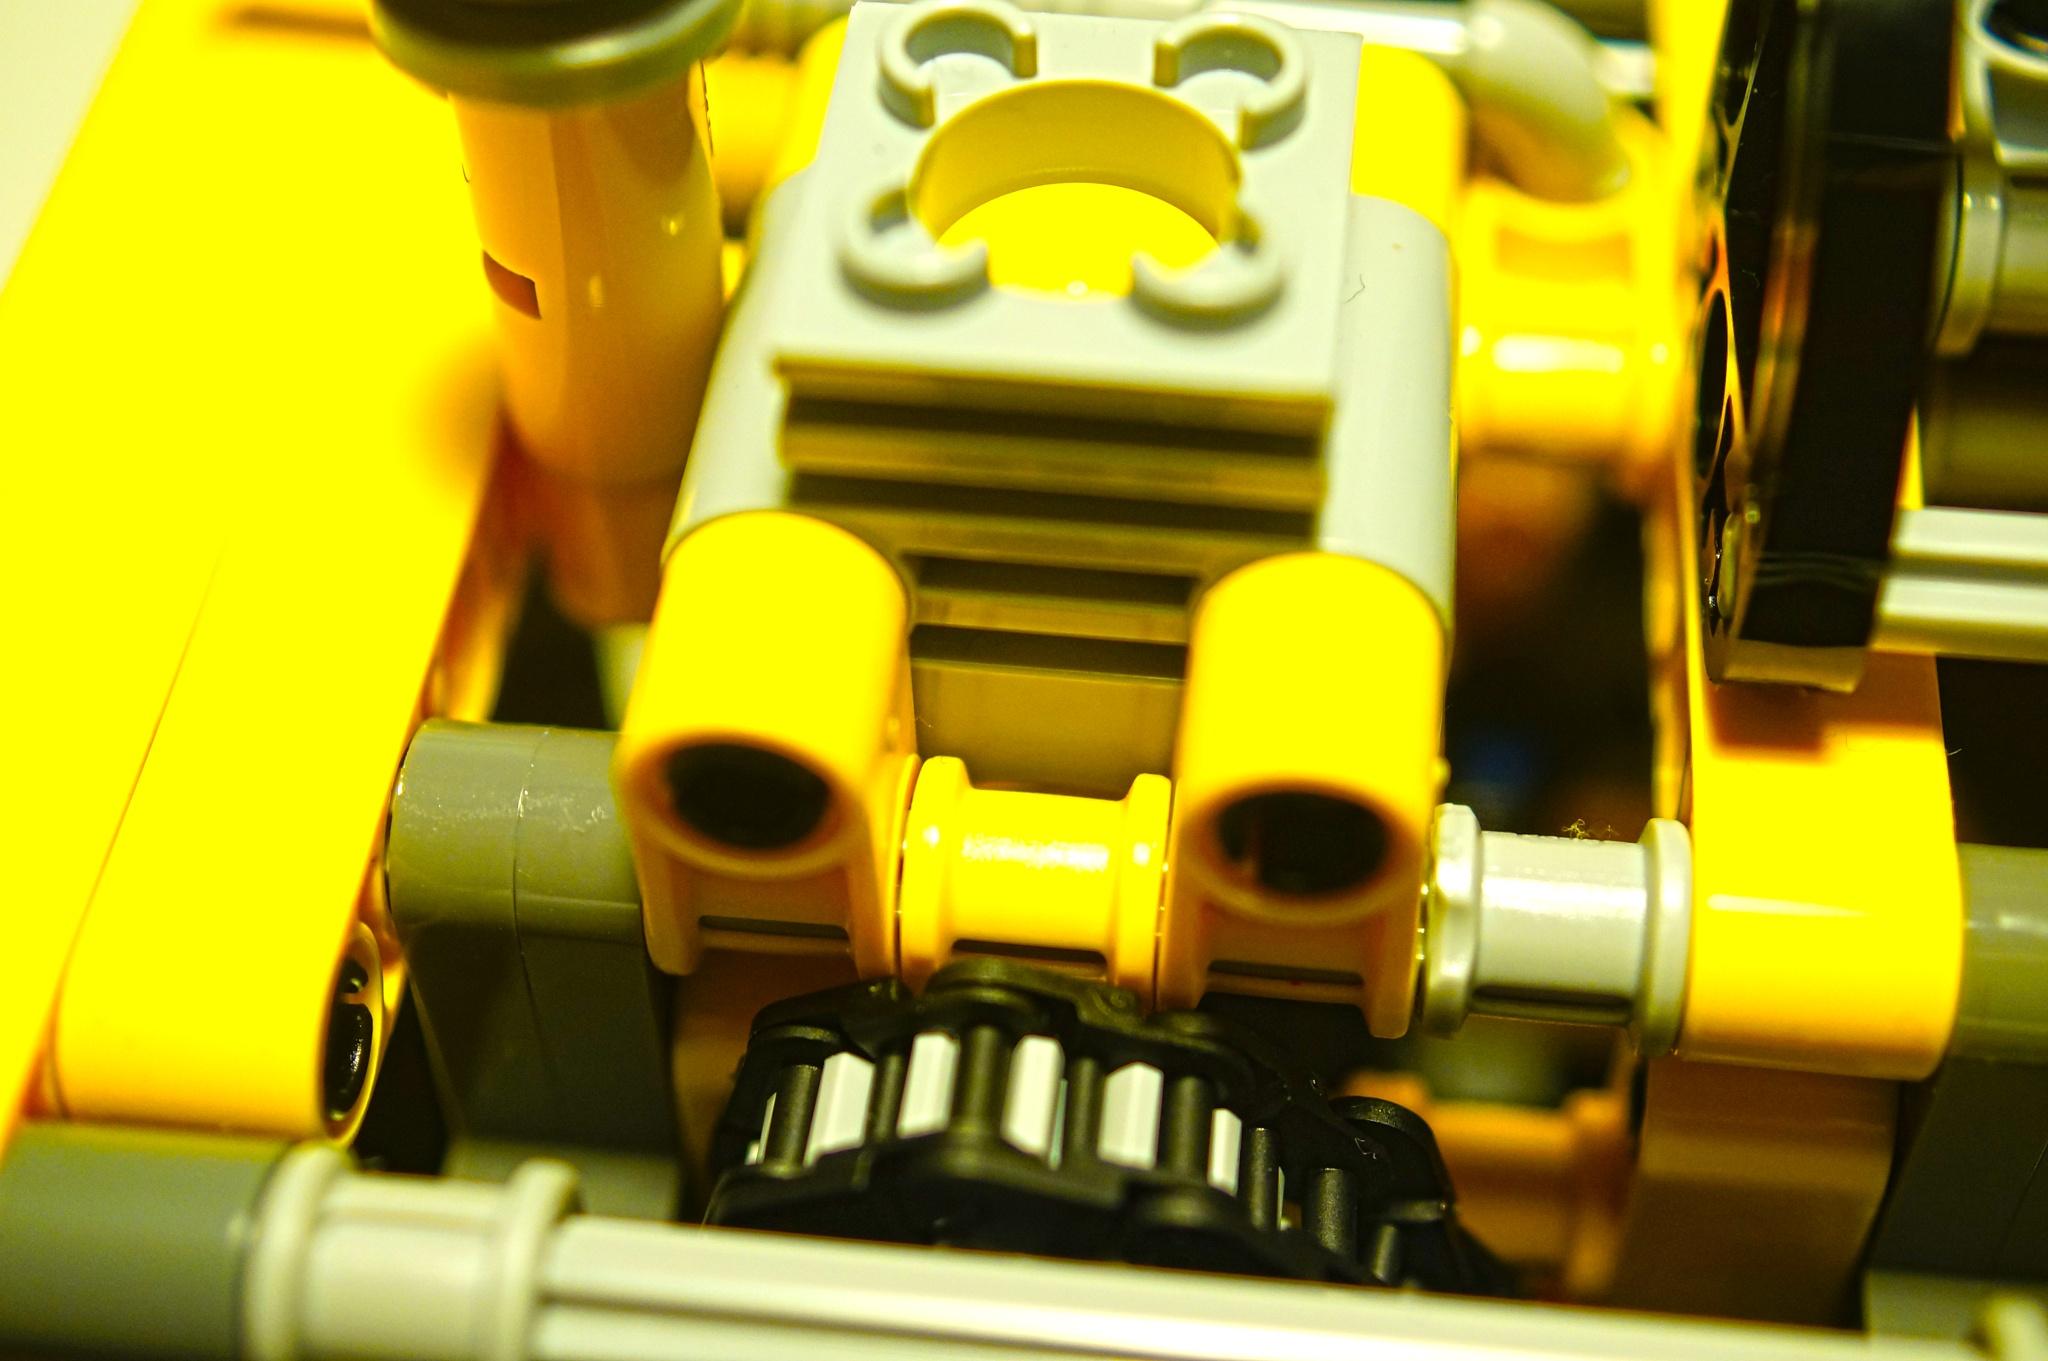 LEGO PISTON-CYLINDER DEVICE by Blackhawk